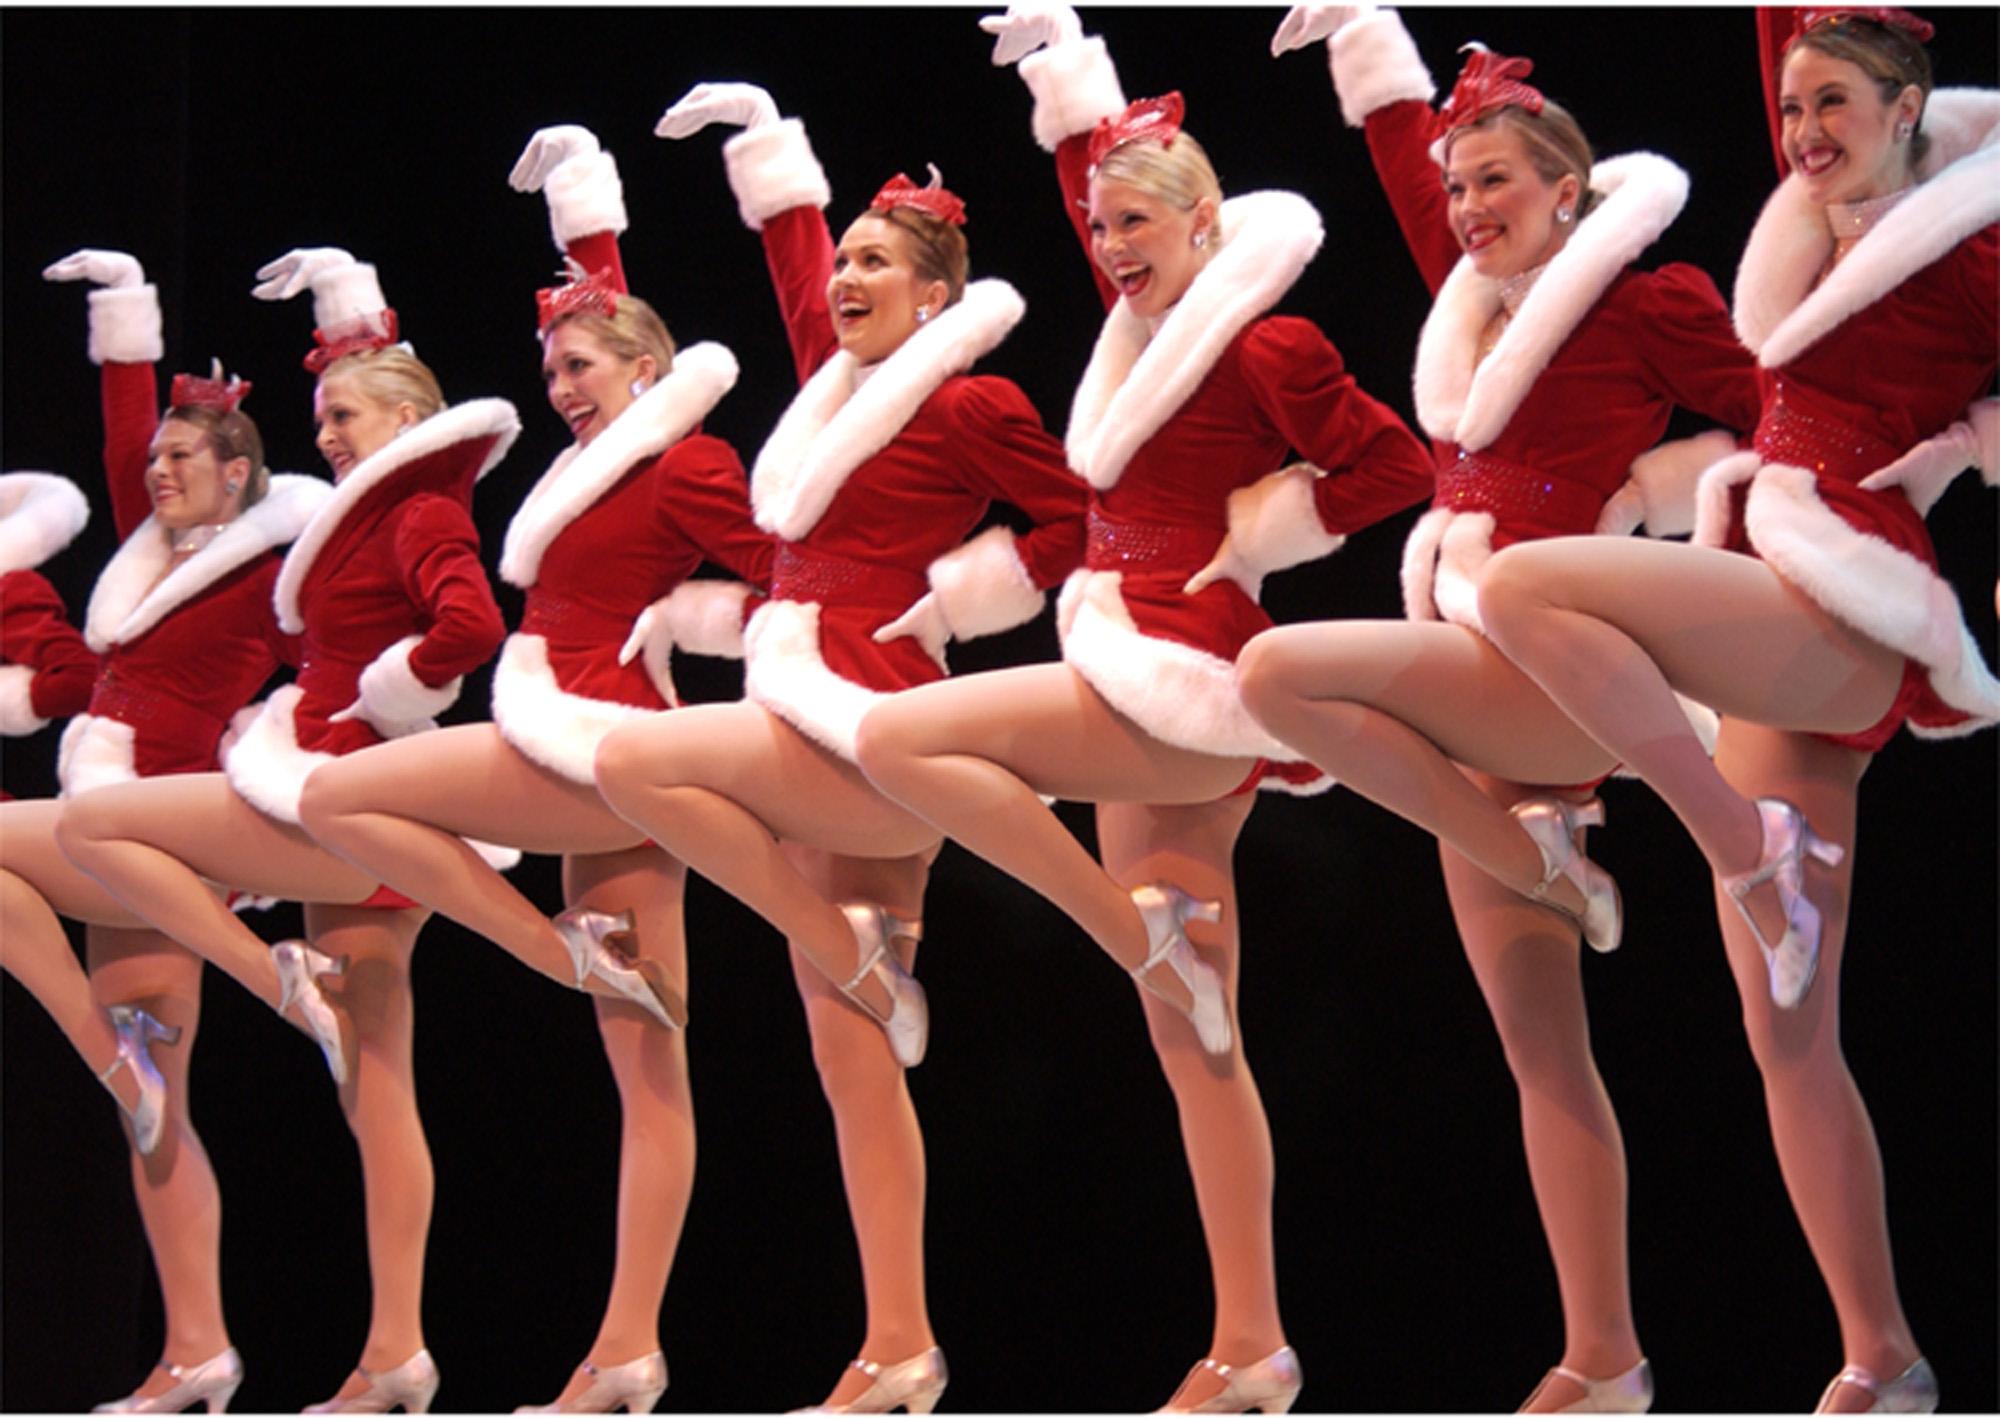 Christmas Rockettes 2020 Rockettes' Annual Christmas Show At NYC's Radio City Music Hall